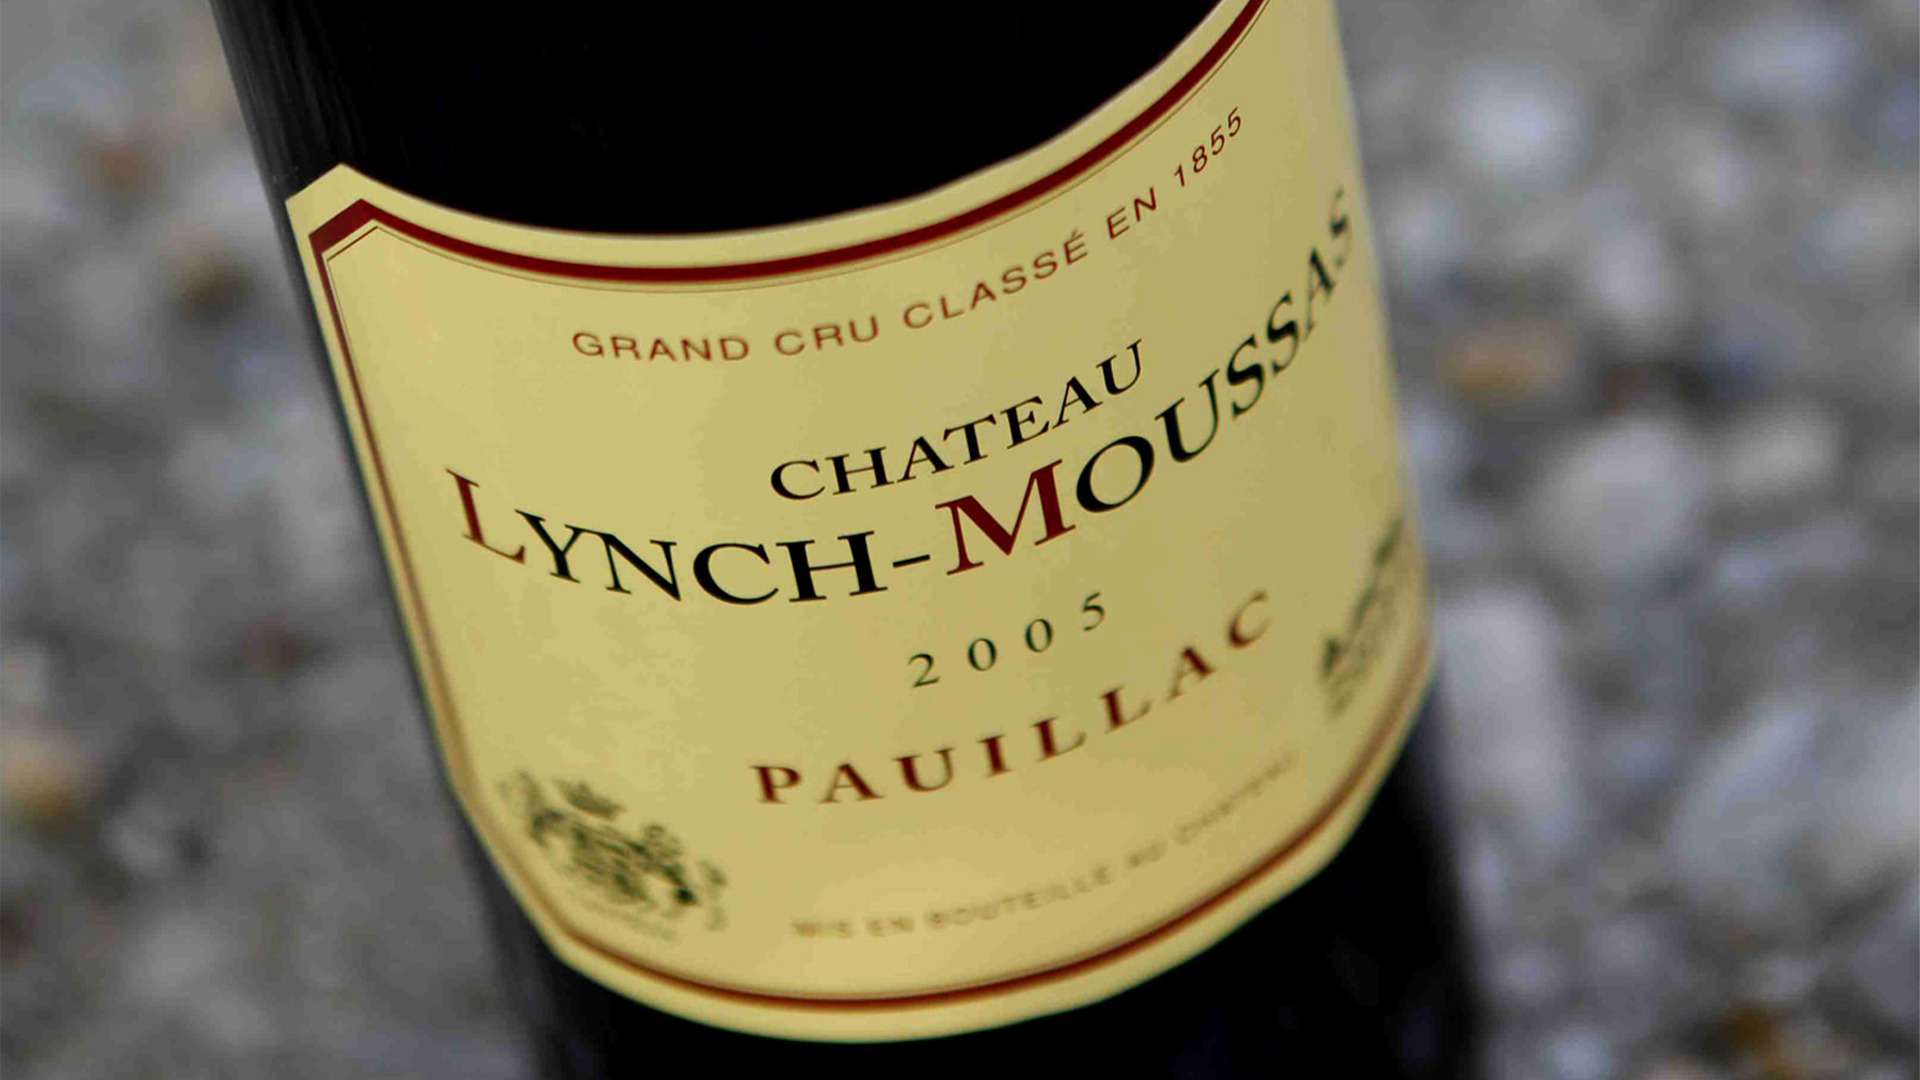 Rượu Vang Chateau Lynch-Moussas